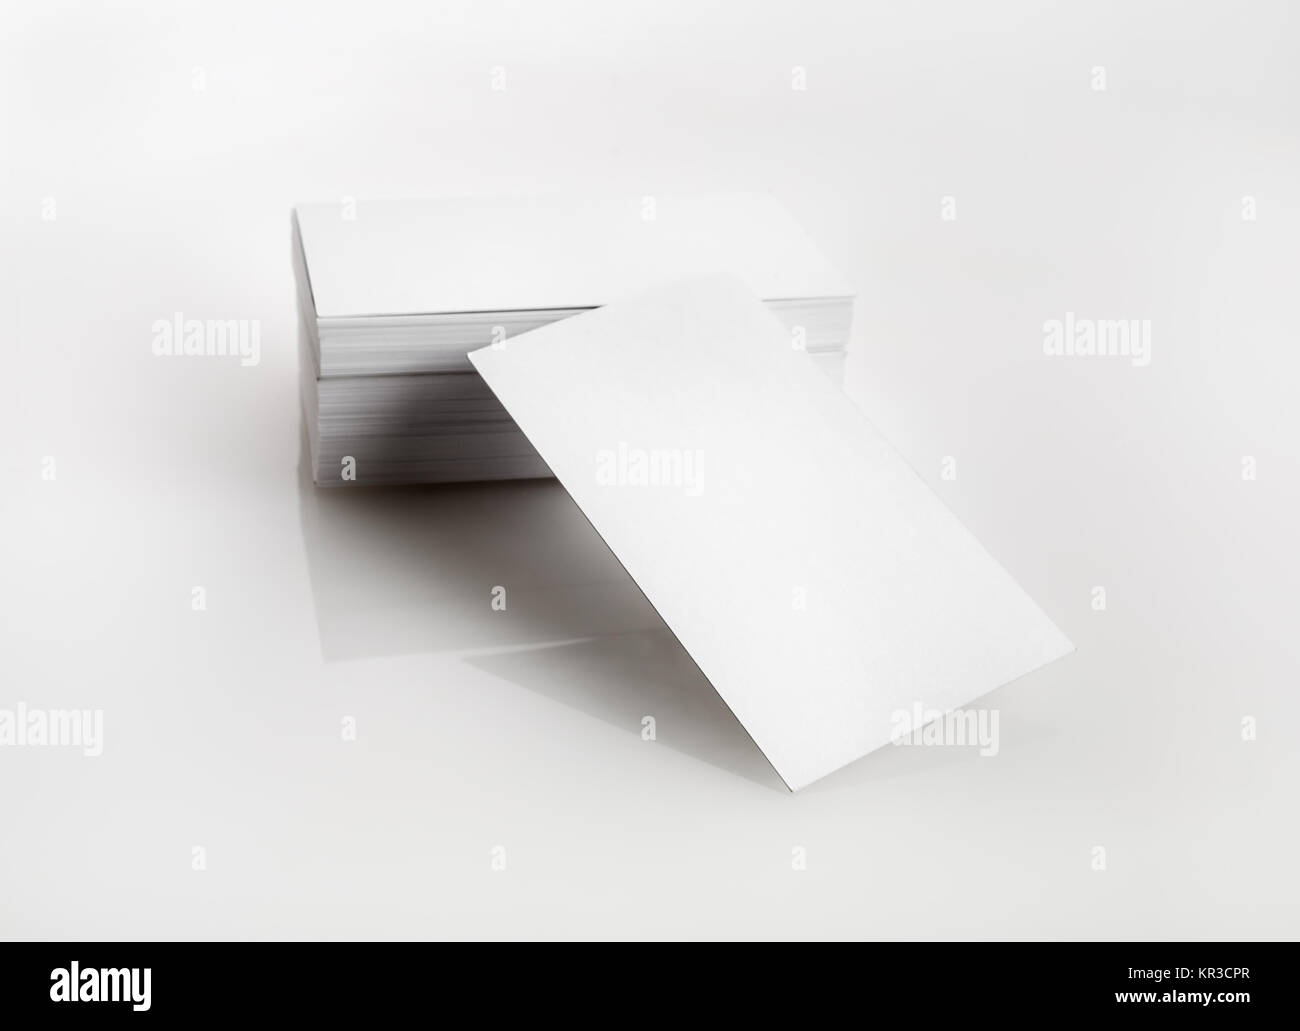 Blank business cards stock photo 169106303 alamy blank business cards colourmoves